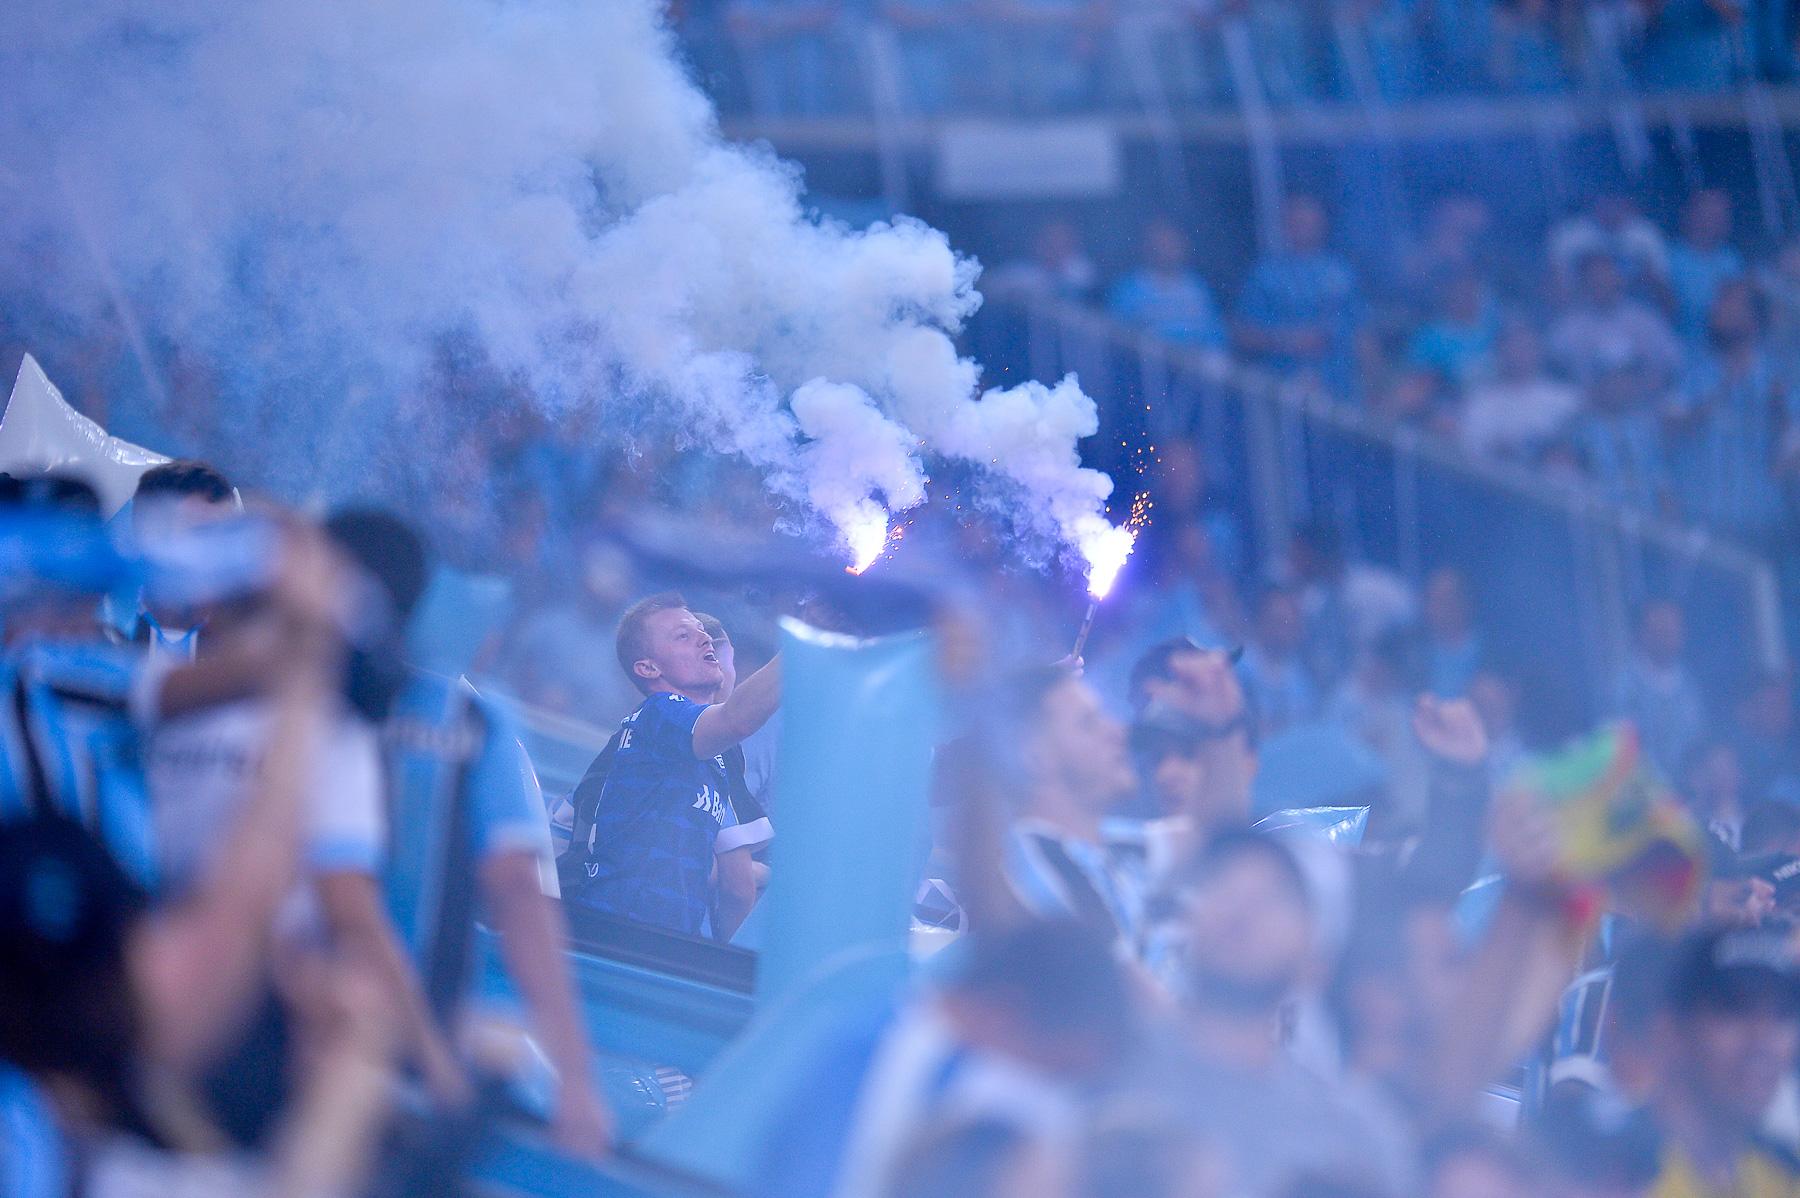 Gremio_X_Flamengo_dudabairros_Eleven_072